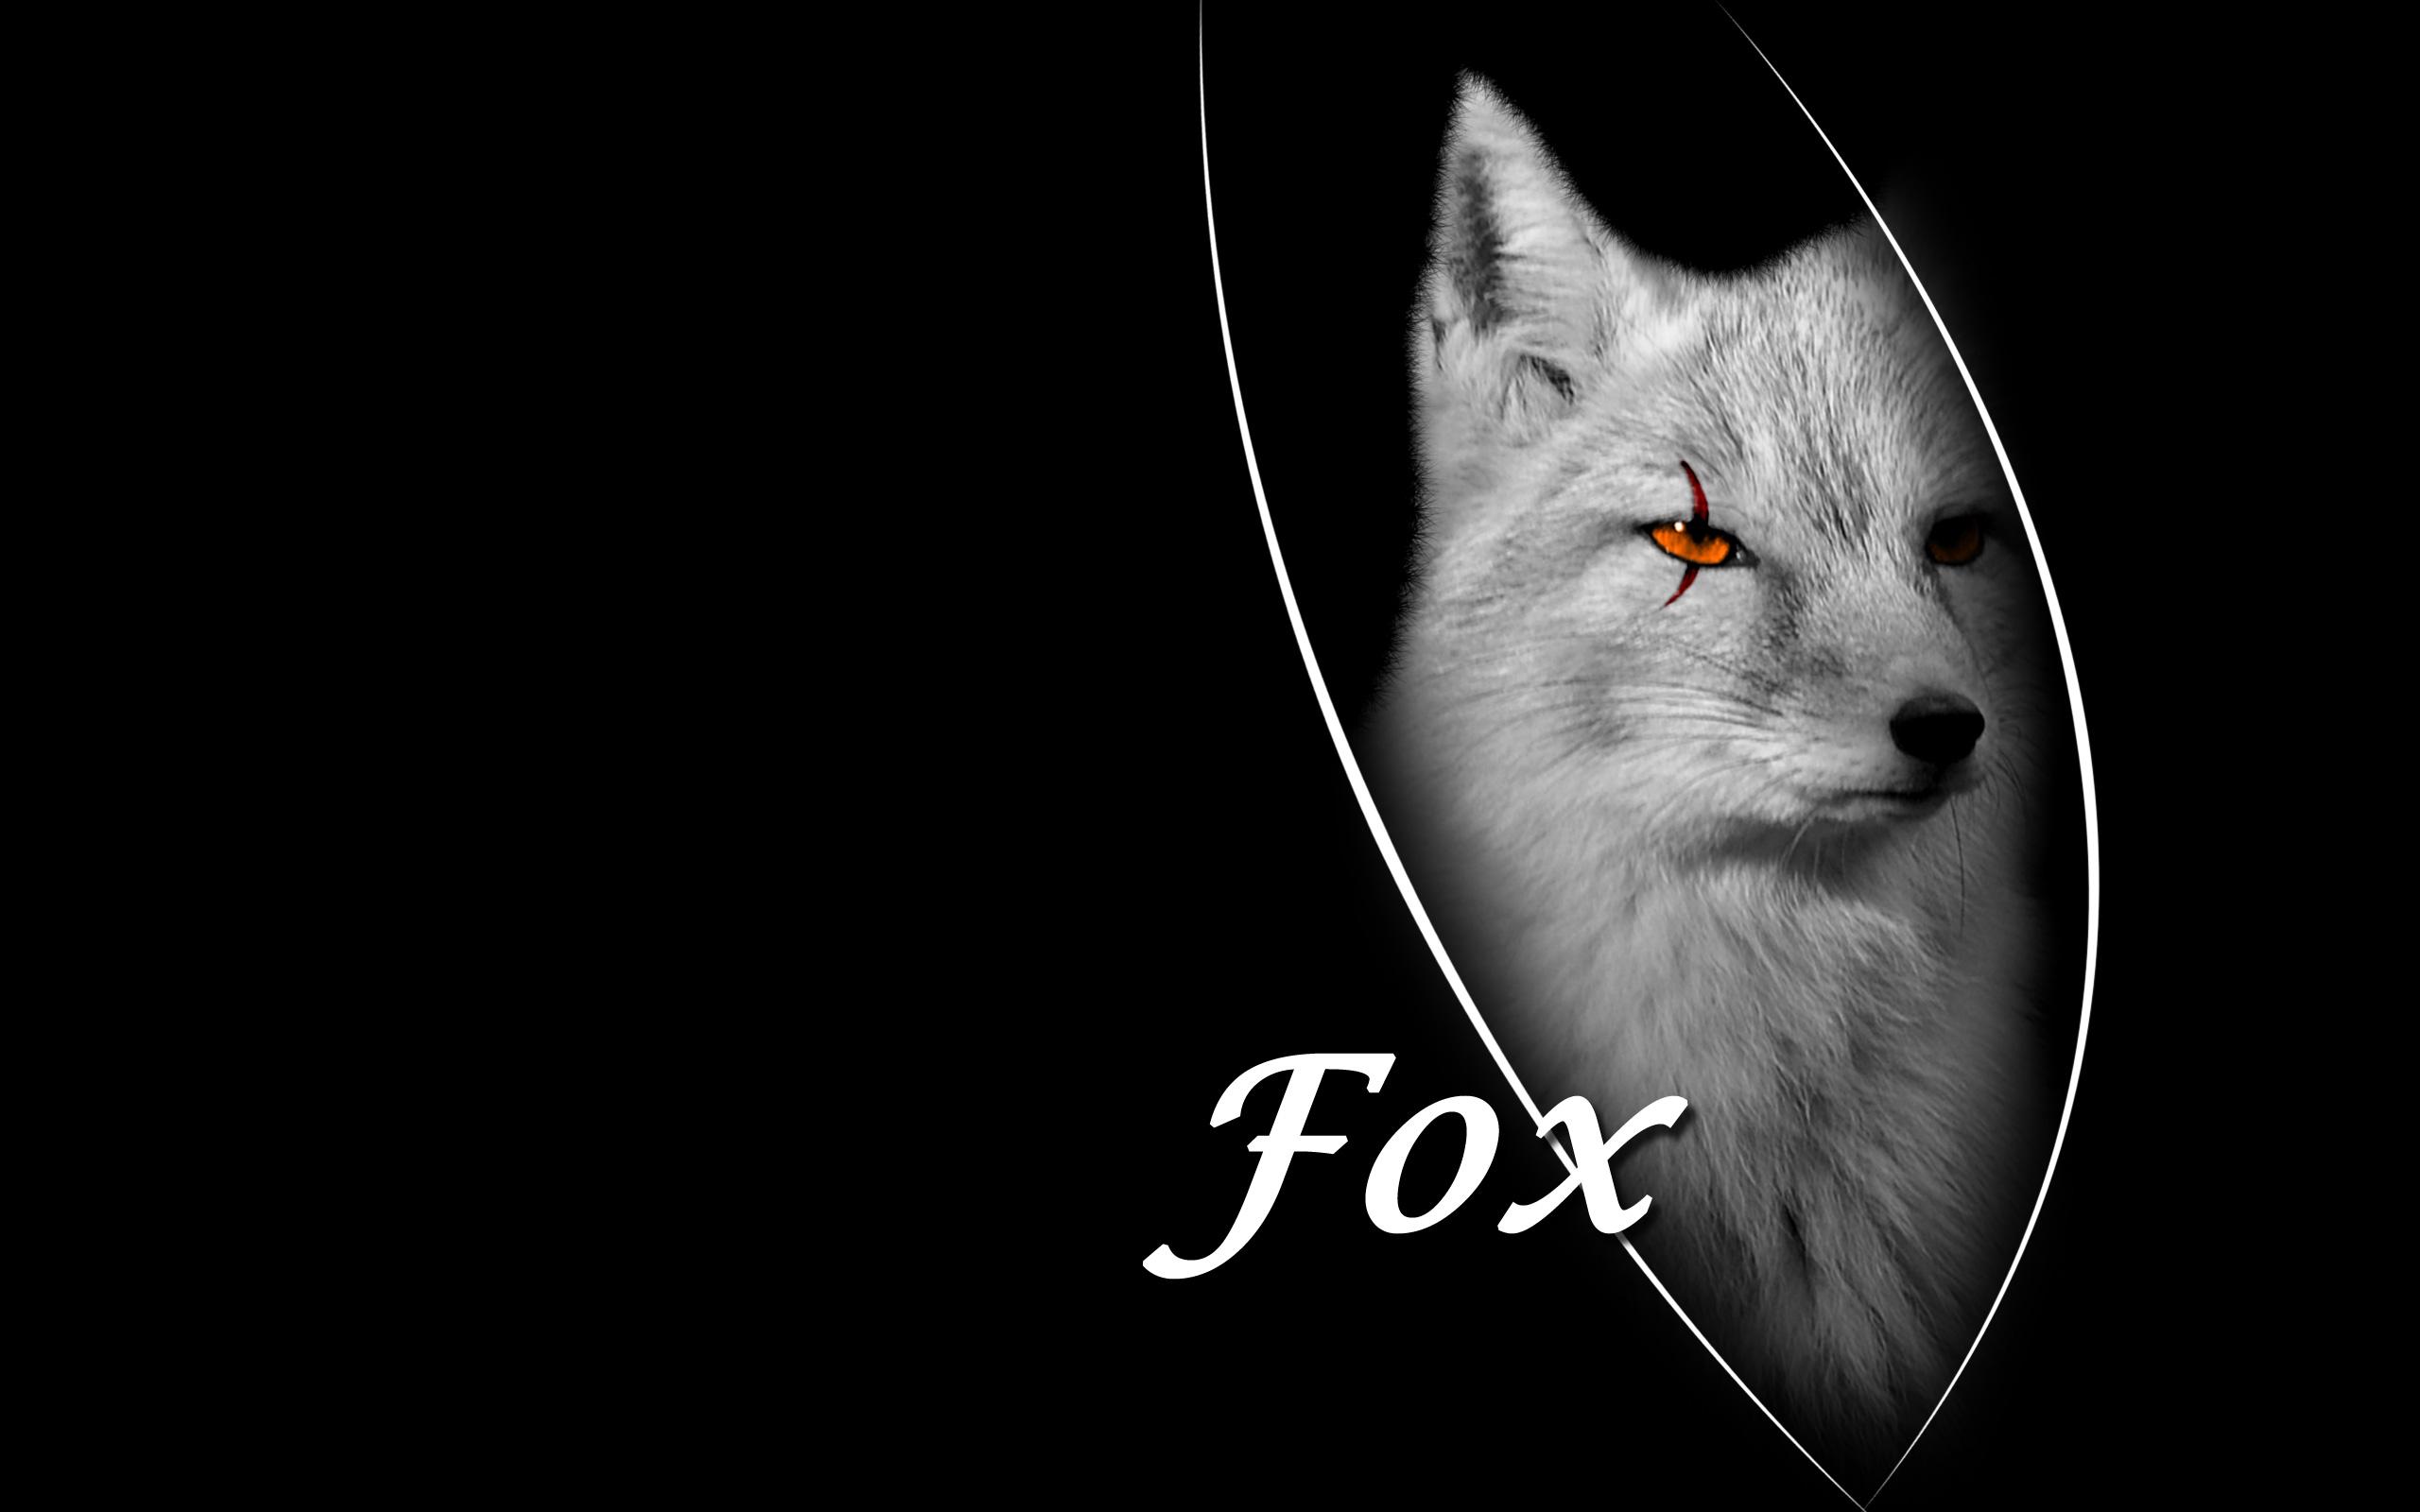 Cool Fox Wallpaper Black Fox 114903 Hd Wallpaper Backgrounds Download